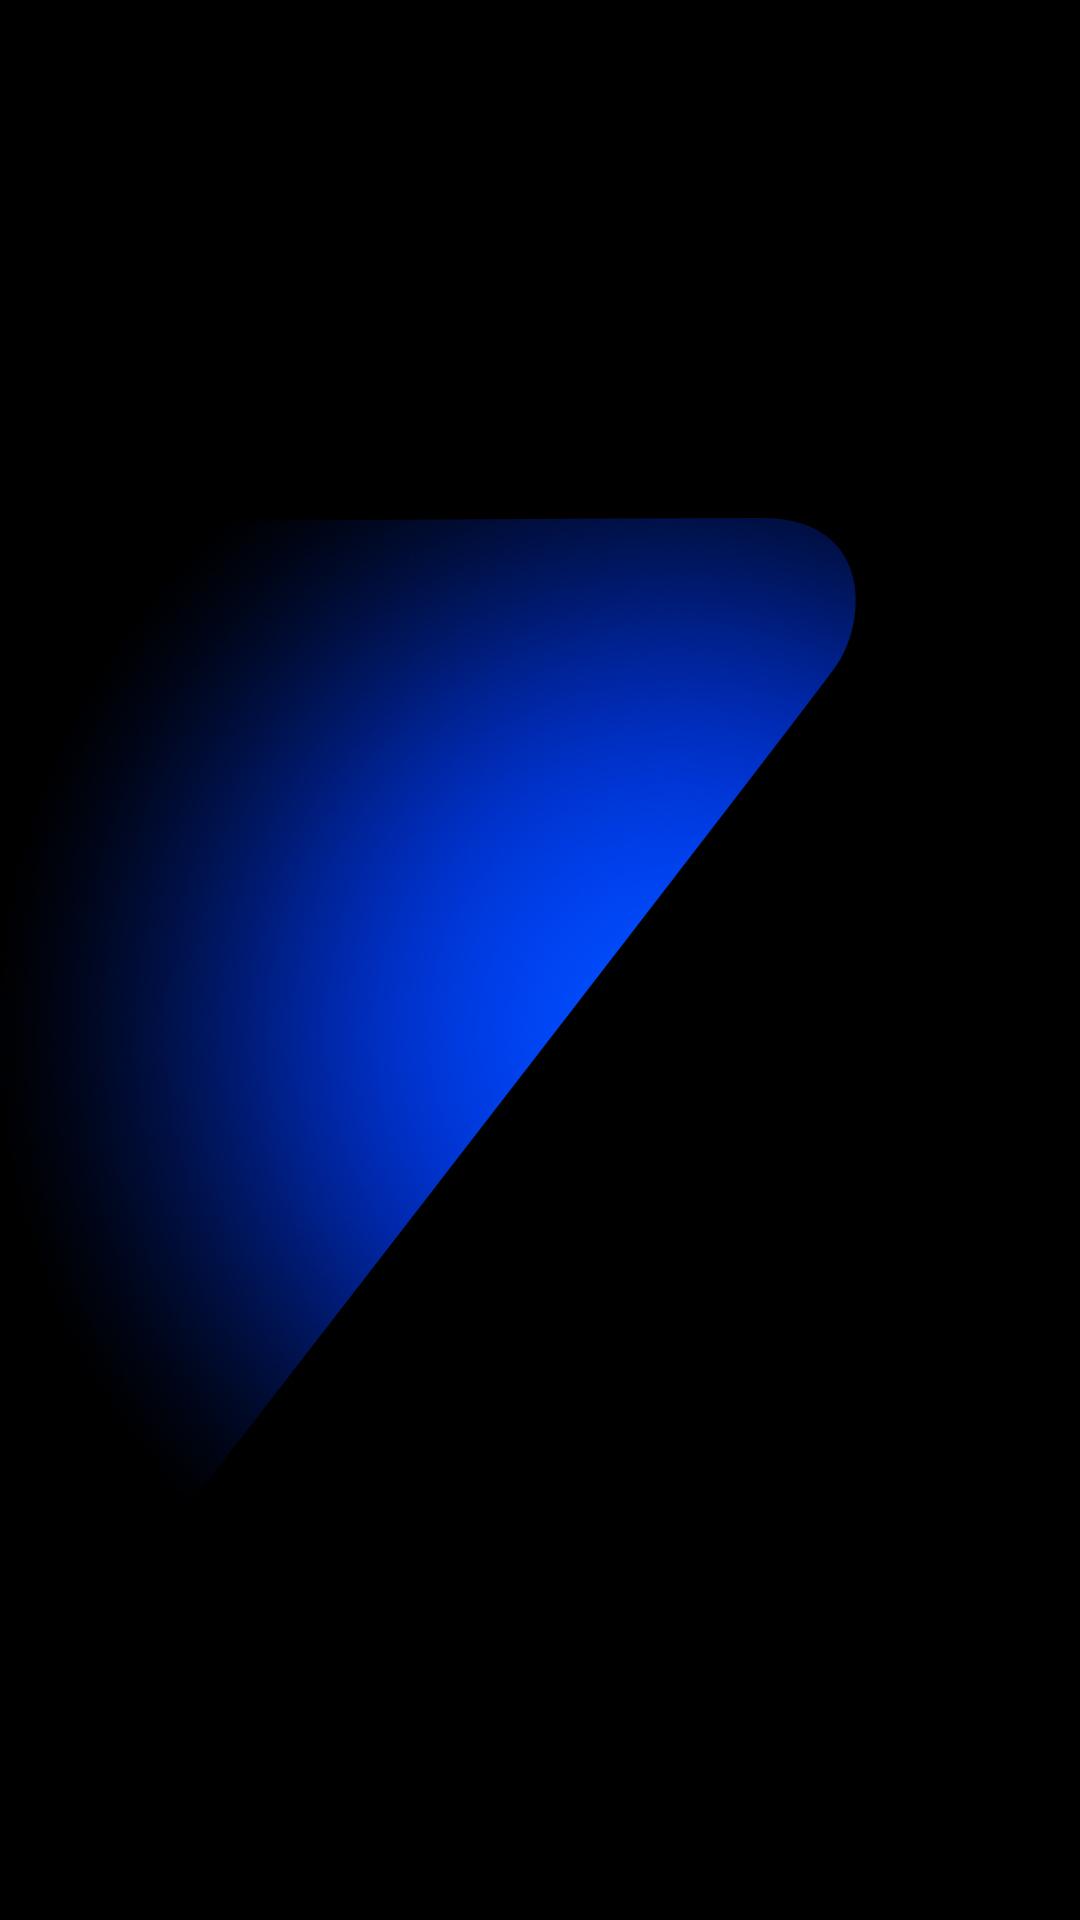 Free Download Download Samsung Galaxy S7 Edge Lock Screen Wallpaper Design 1080x1920 For Your Desktop Mobile Tablet Explore 43 S7 Edge Wallpapers S7 Edge Wallpapers Galaxy S7 Edge Wallpapers